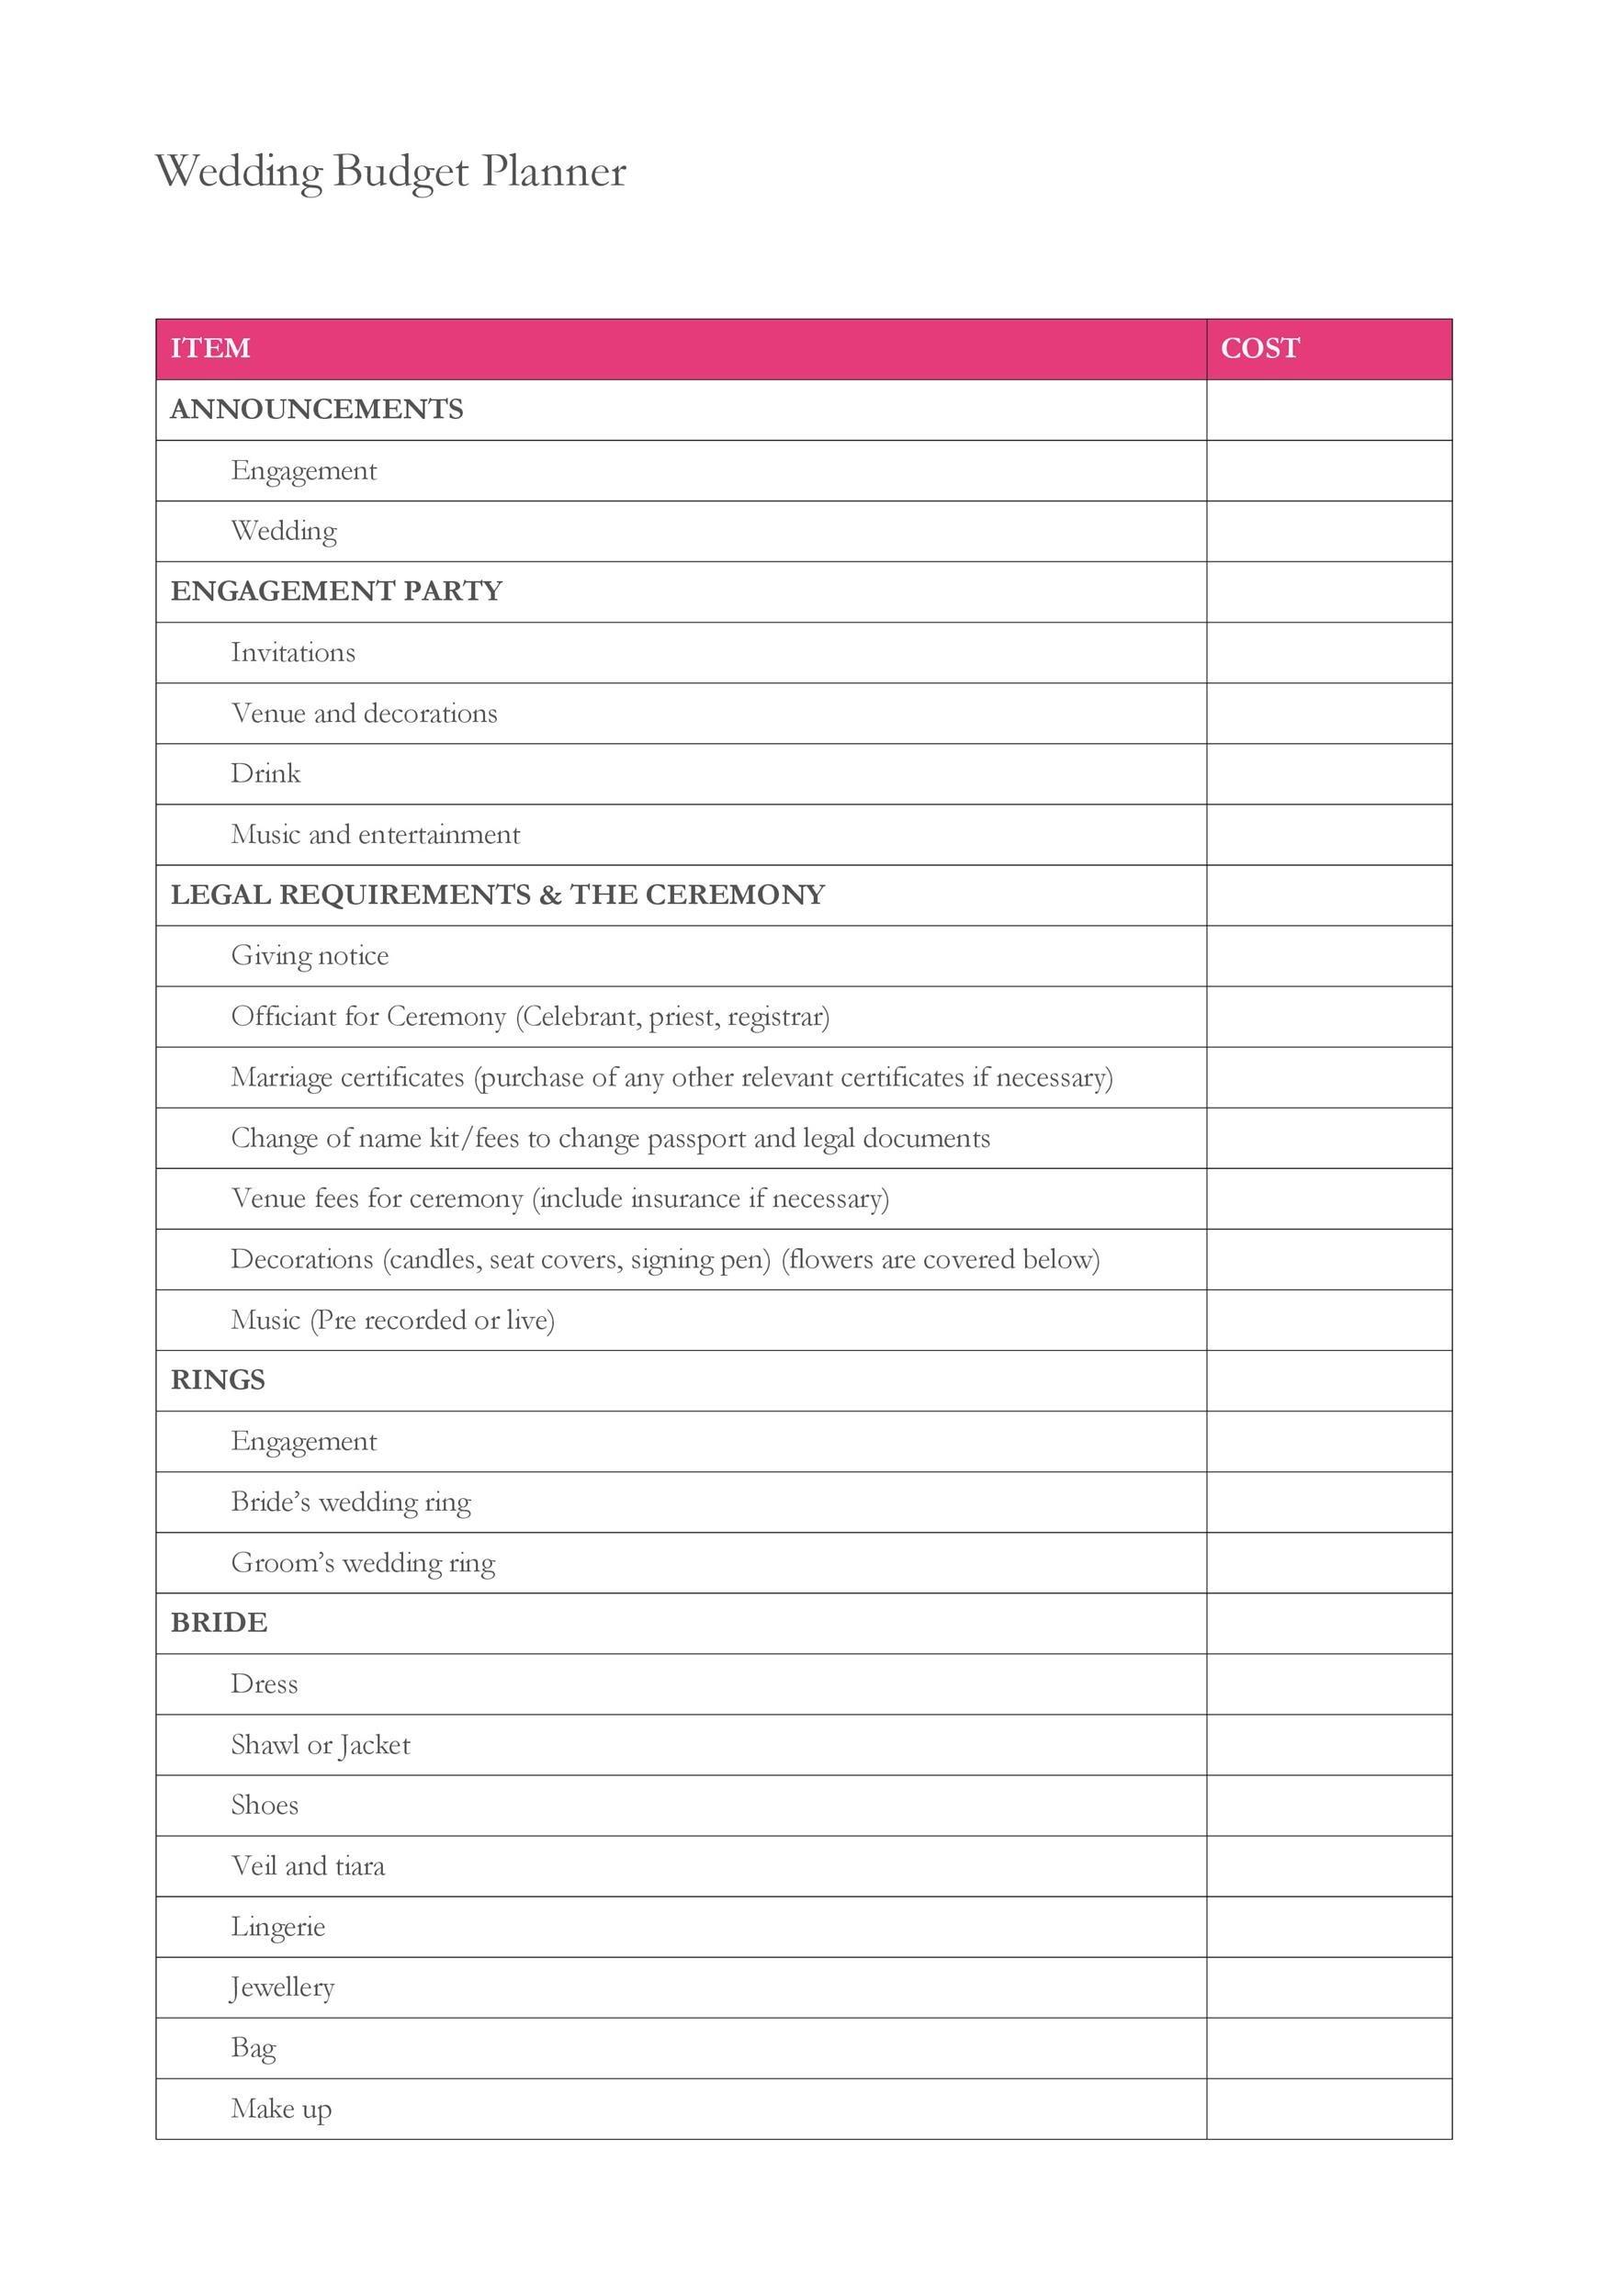 Free weeding budget spreadsheet 40